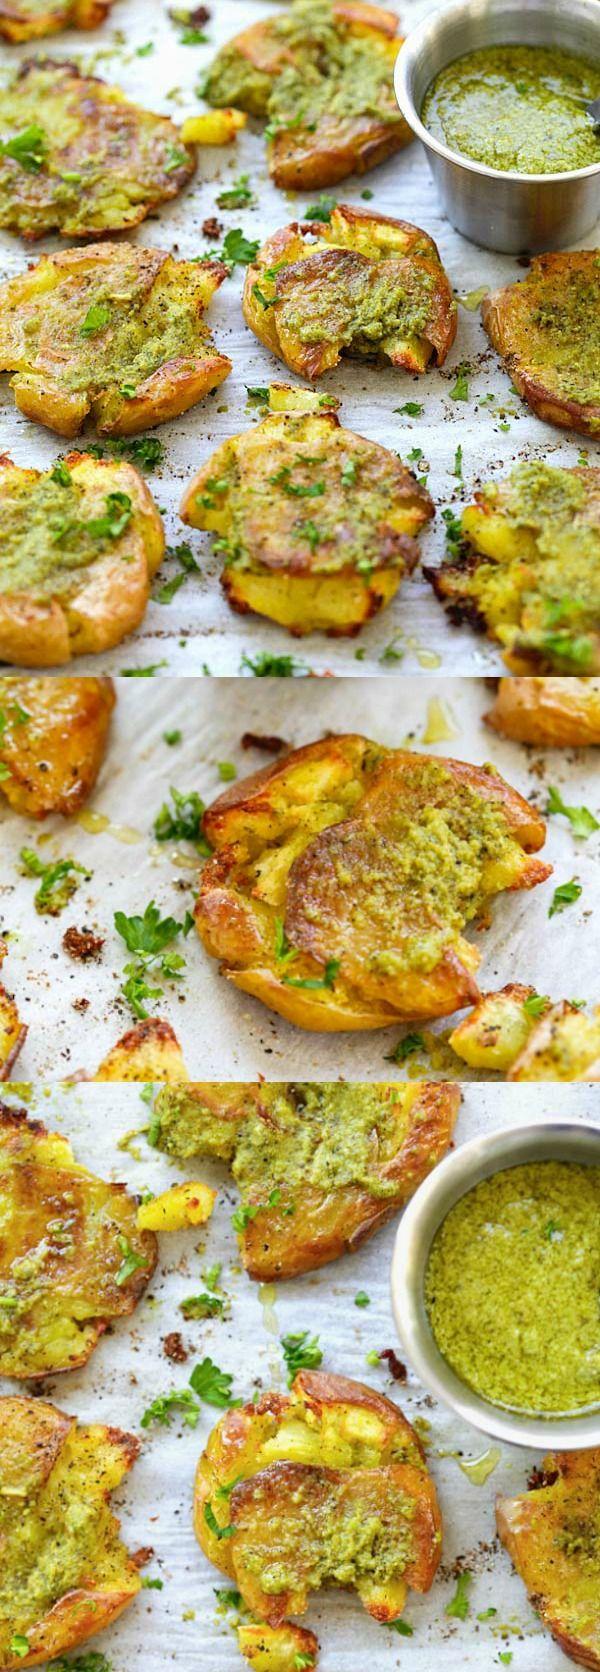 Garlic Pesto Smashed Potatoes – the best potatoes recipe ever with smashed baby potatoes topped with delicious garlic pesto. So good | rasamalaysia.com